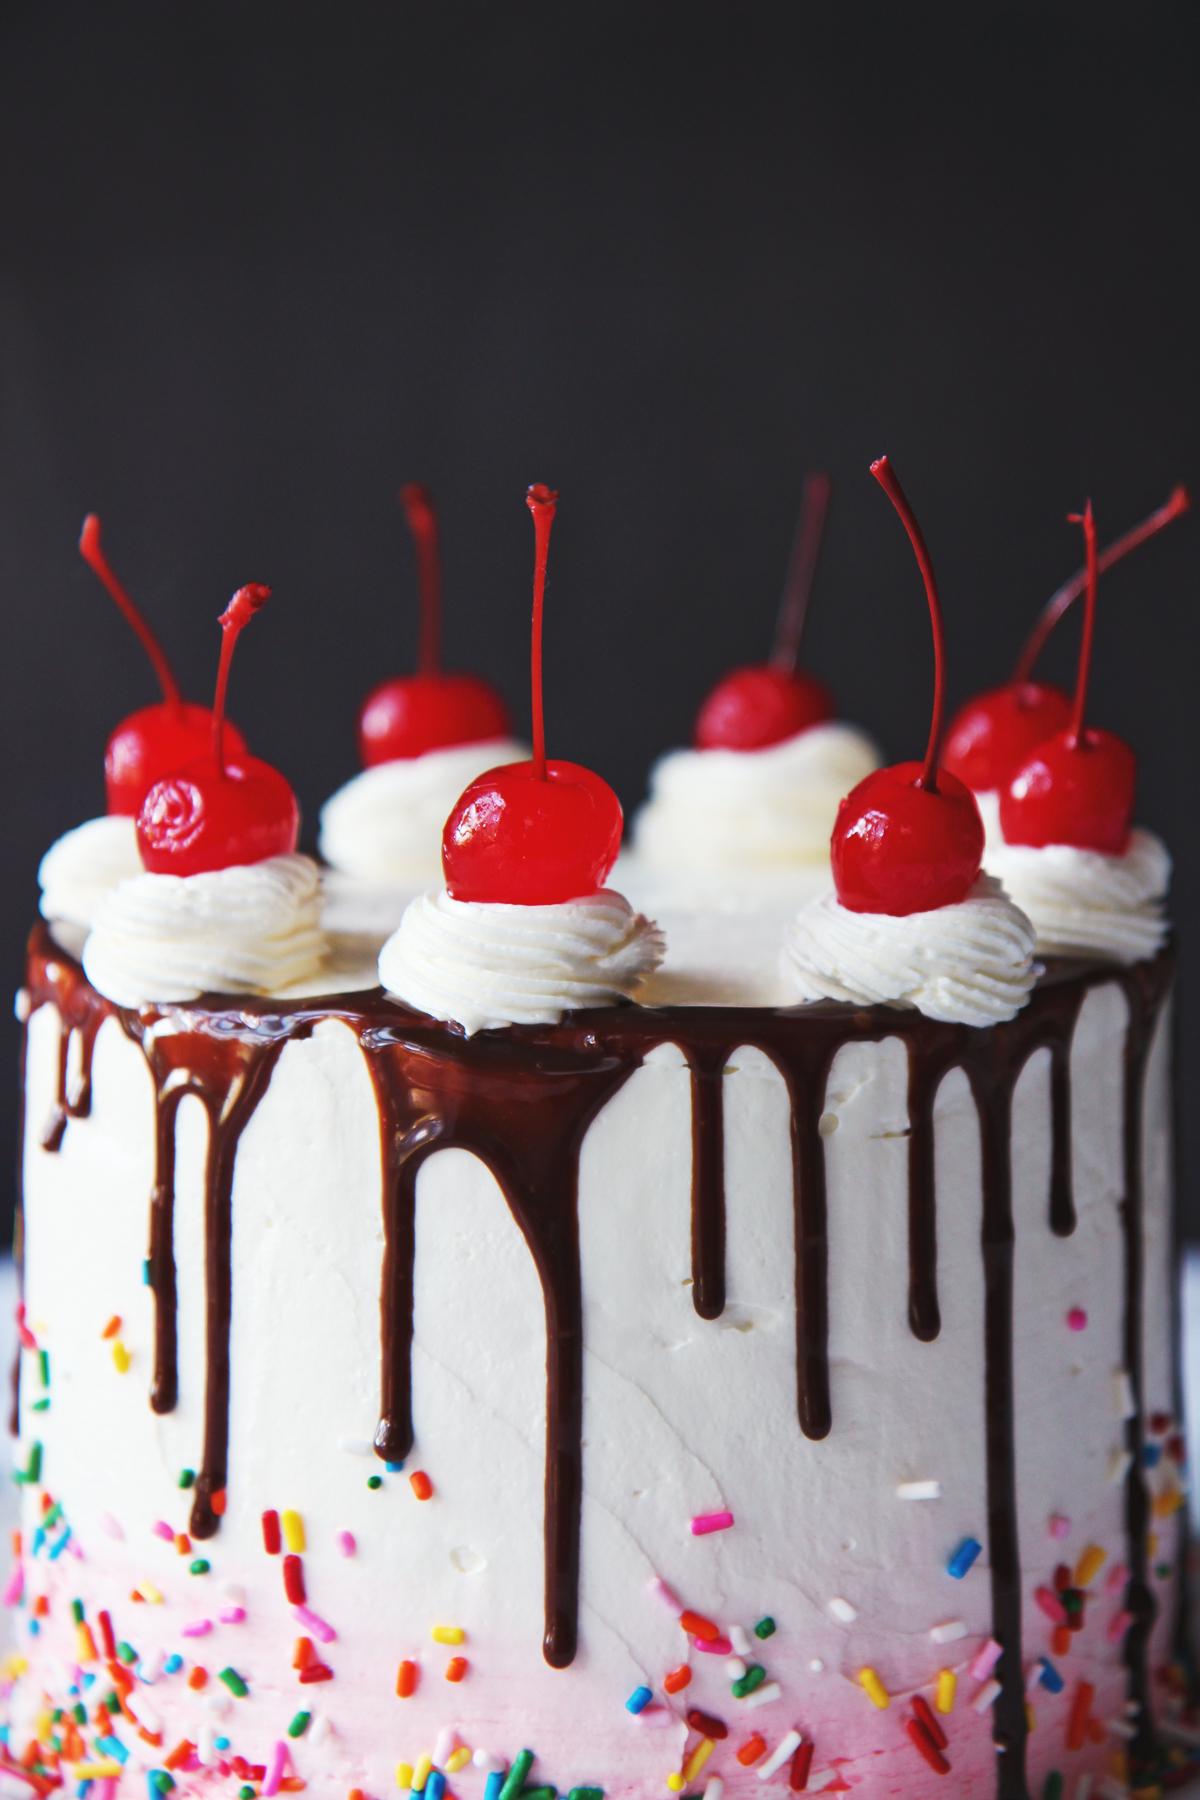 Vanilla Almond Cake | La Pêche Fraîche